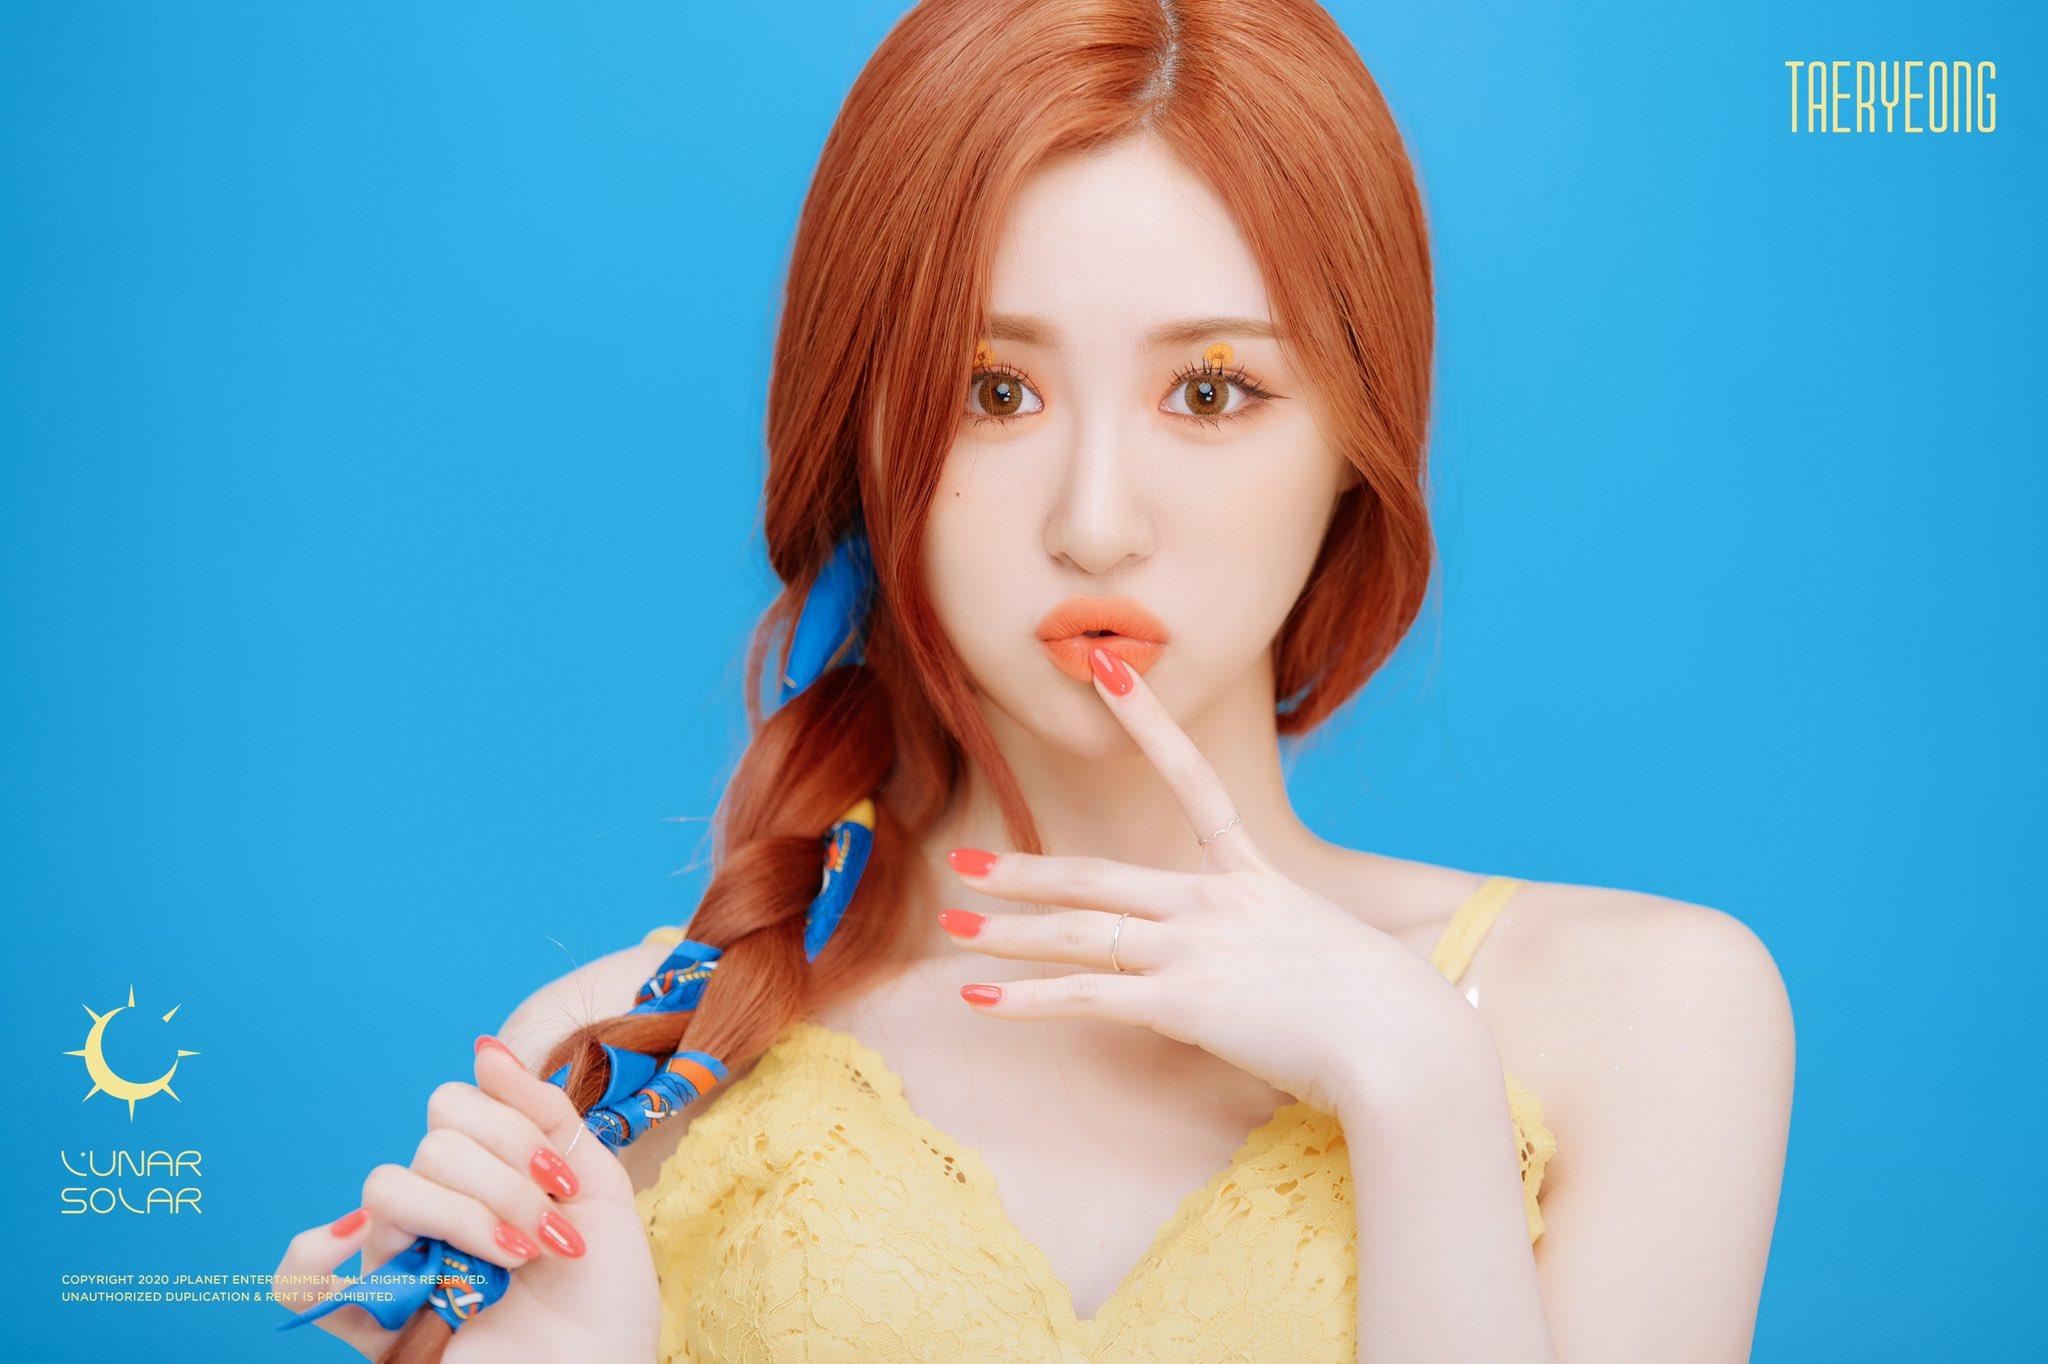 Taeryeong profile image